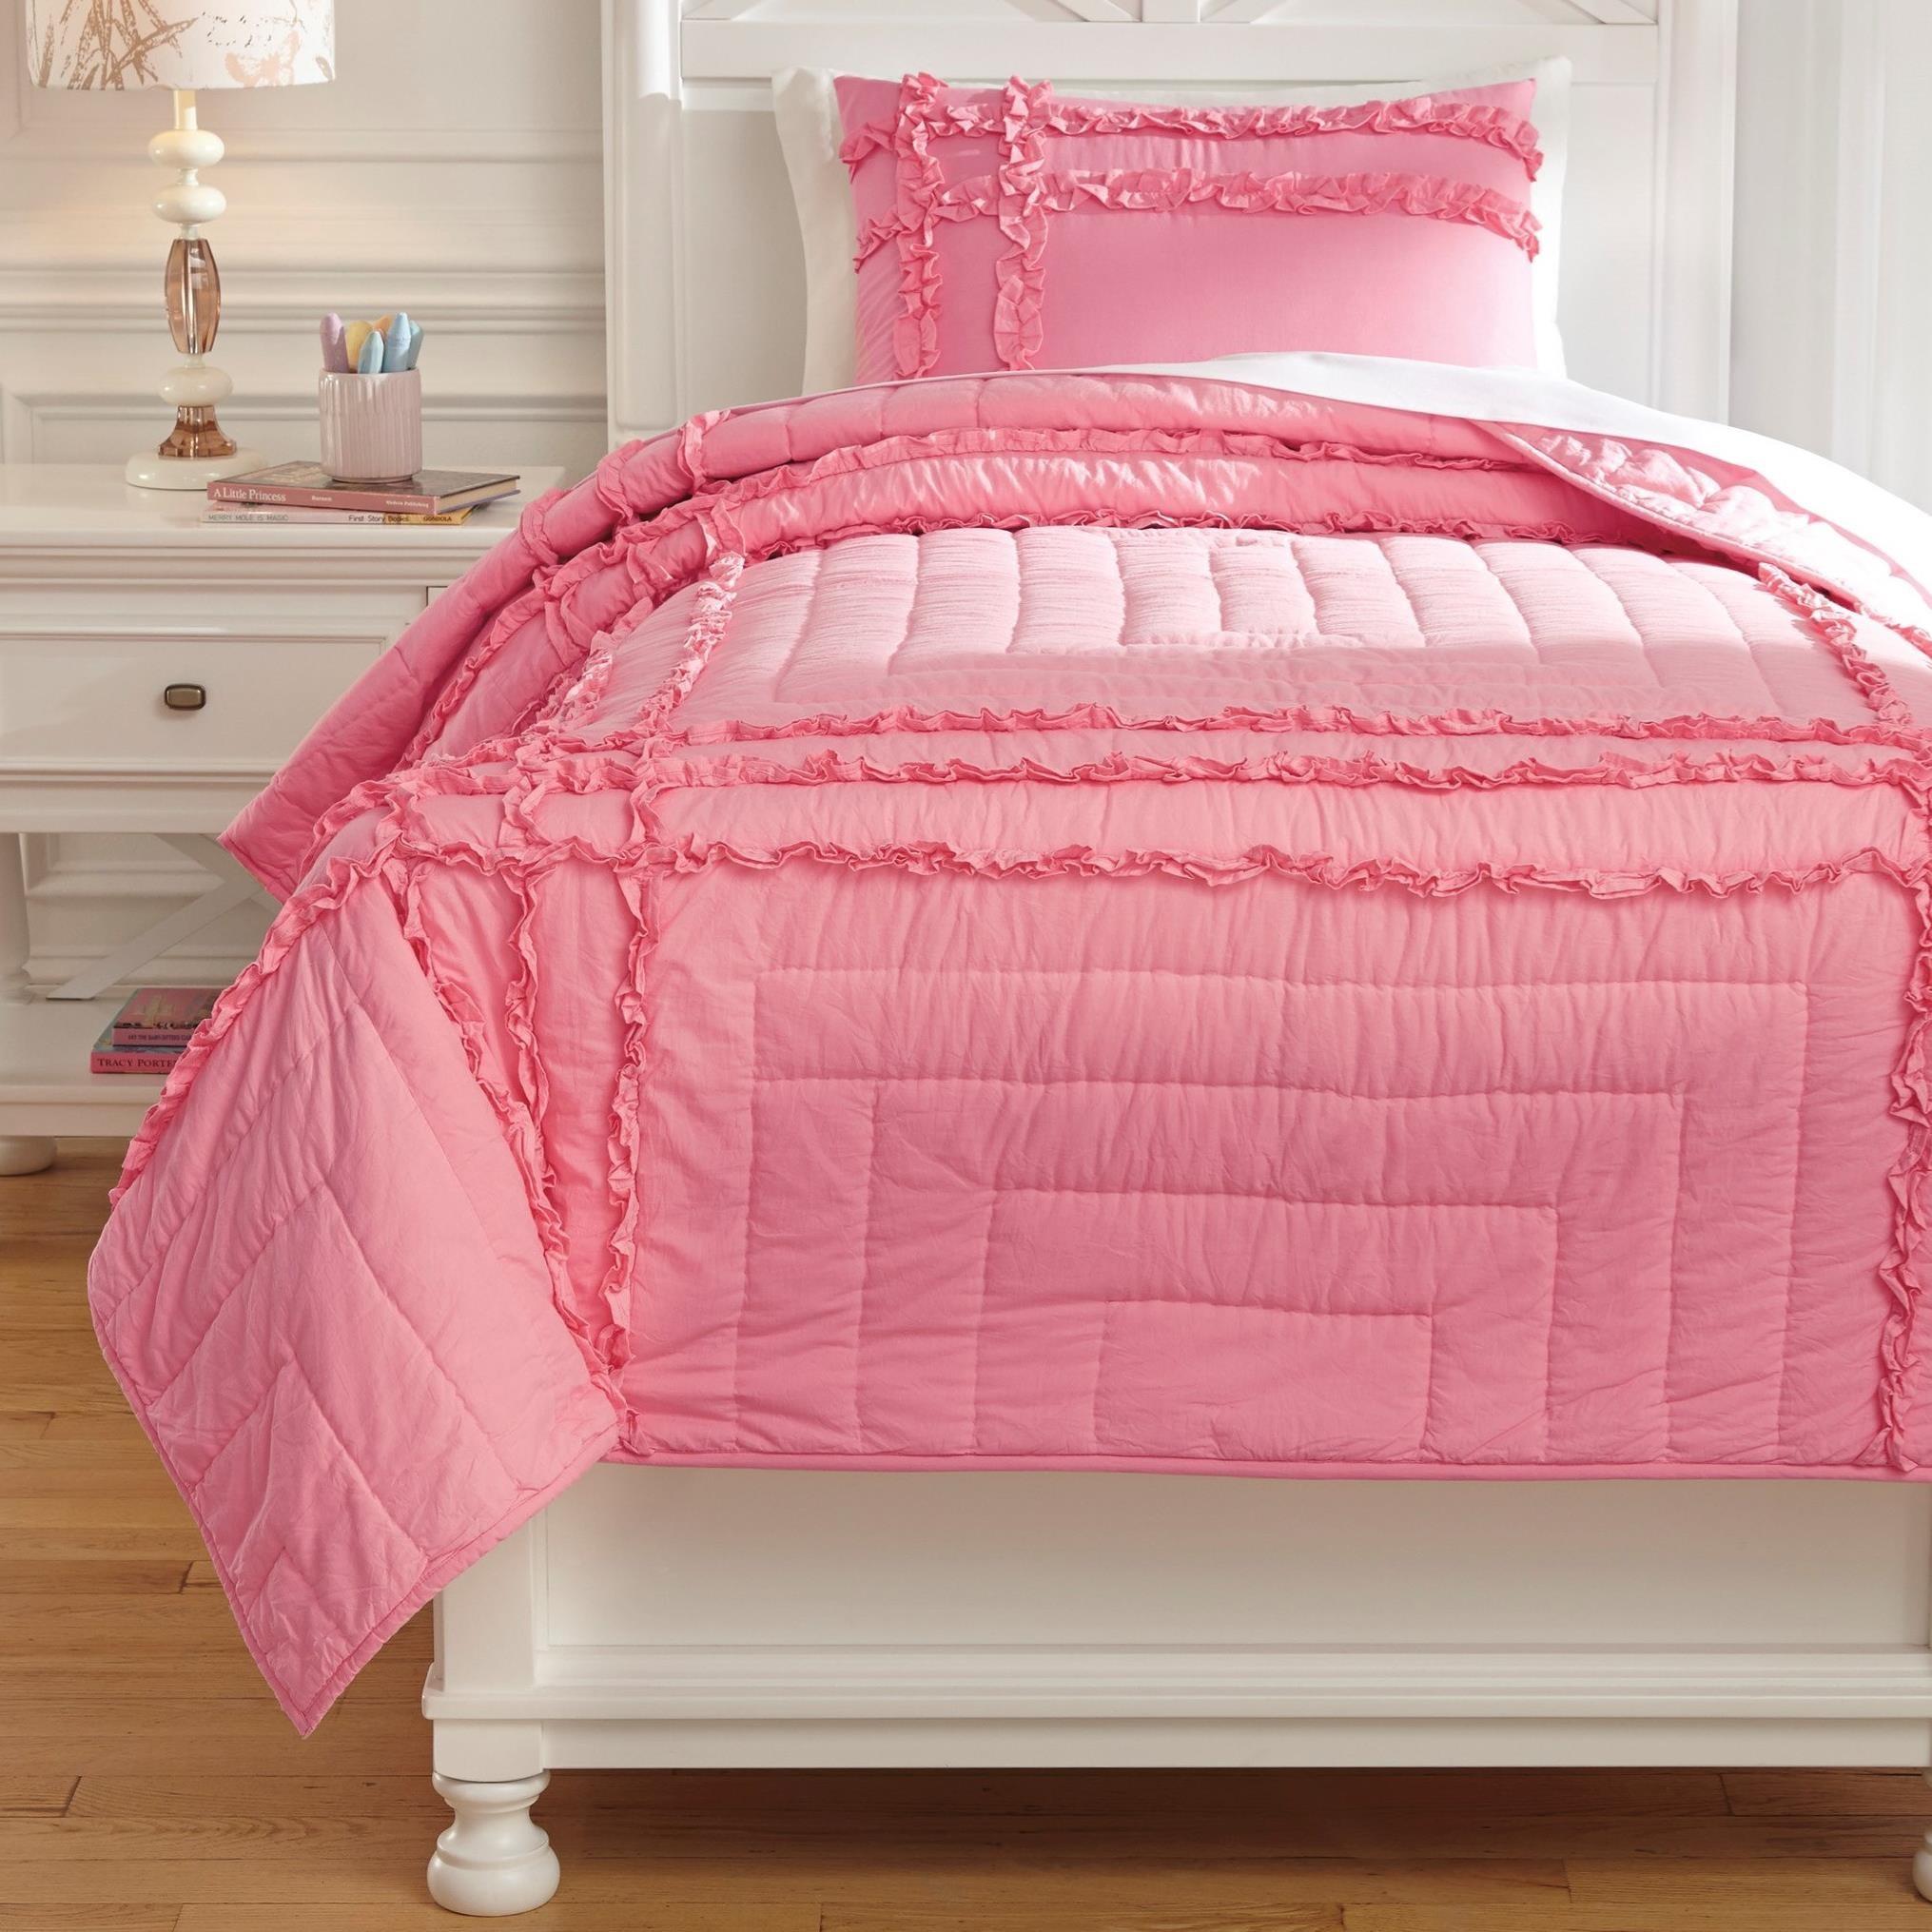 Bedding Sets Twin Megara Pink Quilt Set by Signature Design by Ashley at Lapeer Furniture & Mattress Center